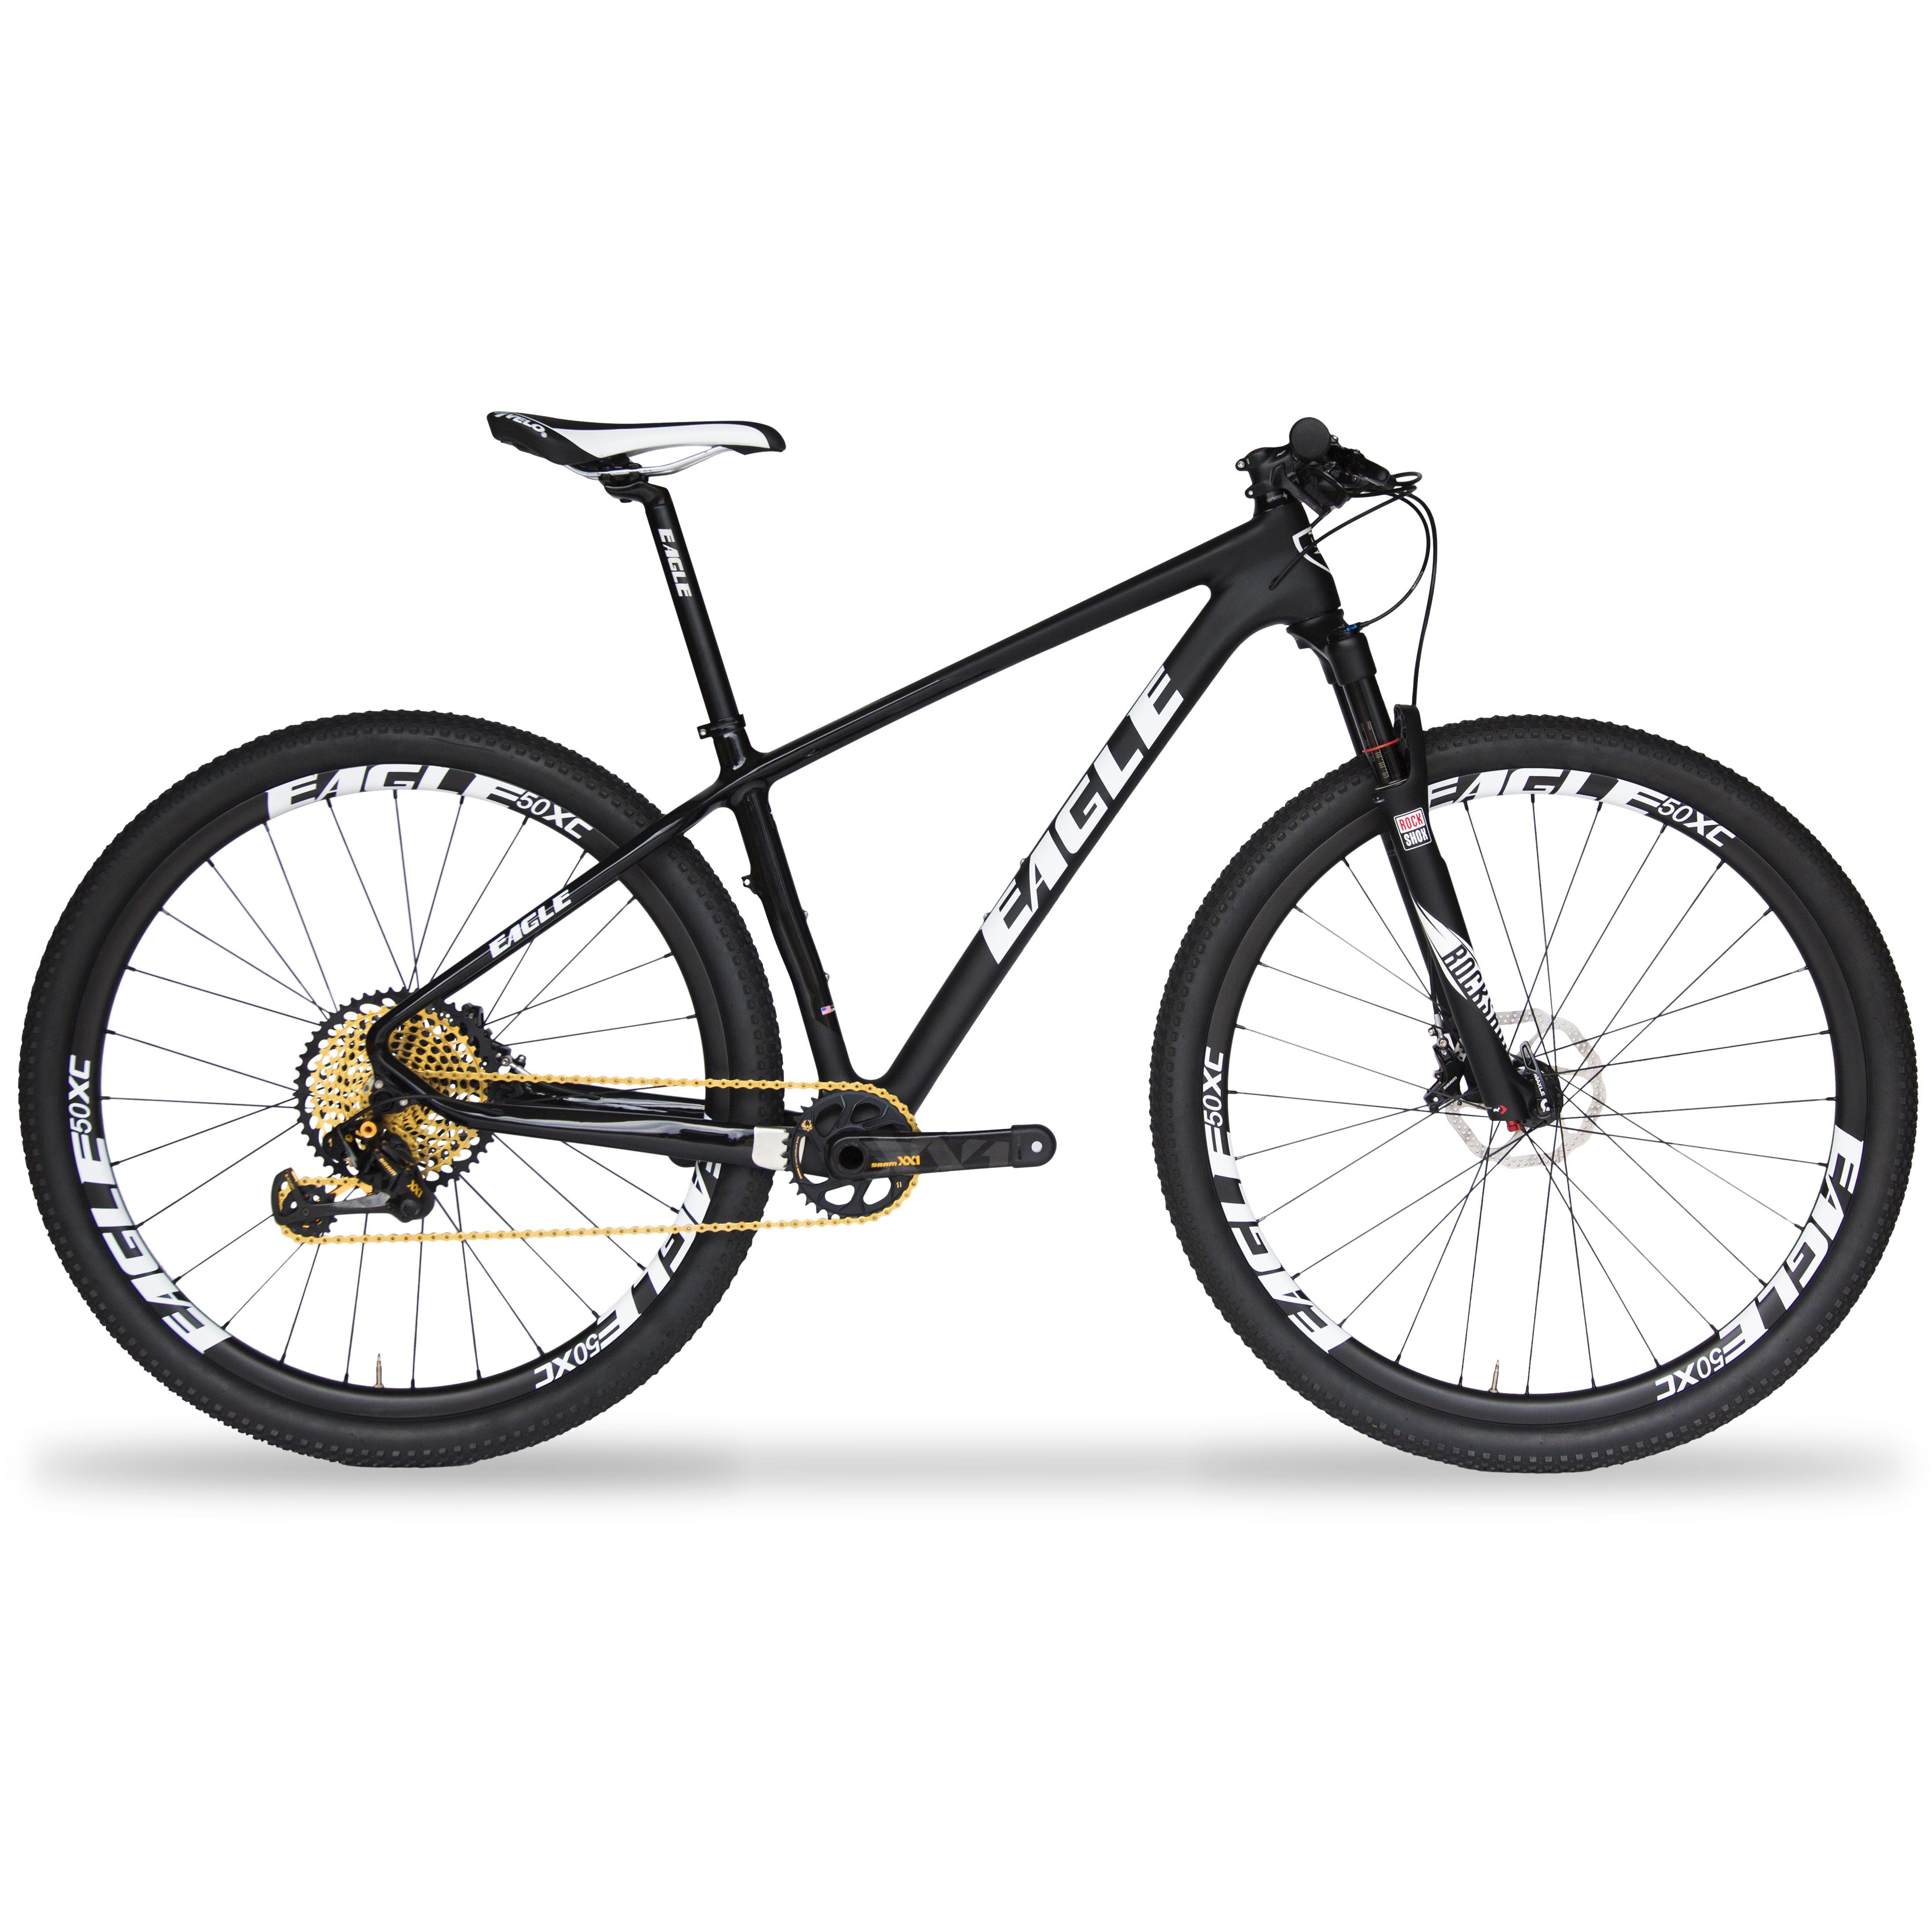 Eagle Patriot Gold Carbon Fiber Mountain Bike - SRAM XX1